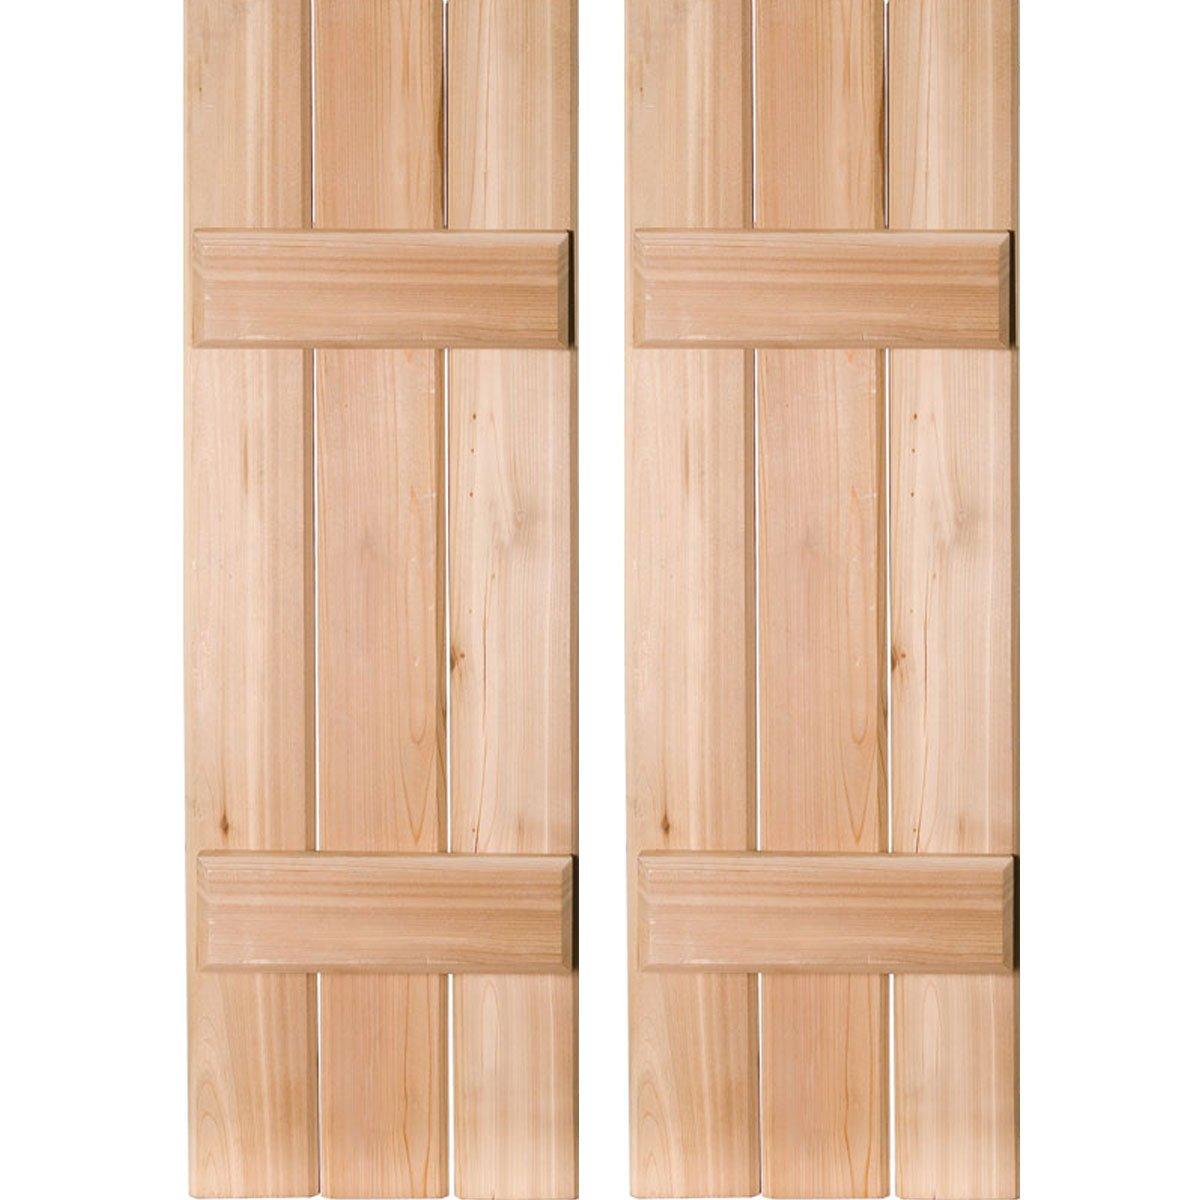 Ekena Millwork RWB12X052UNW Exterior Three Board